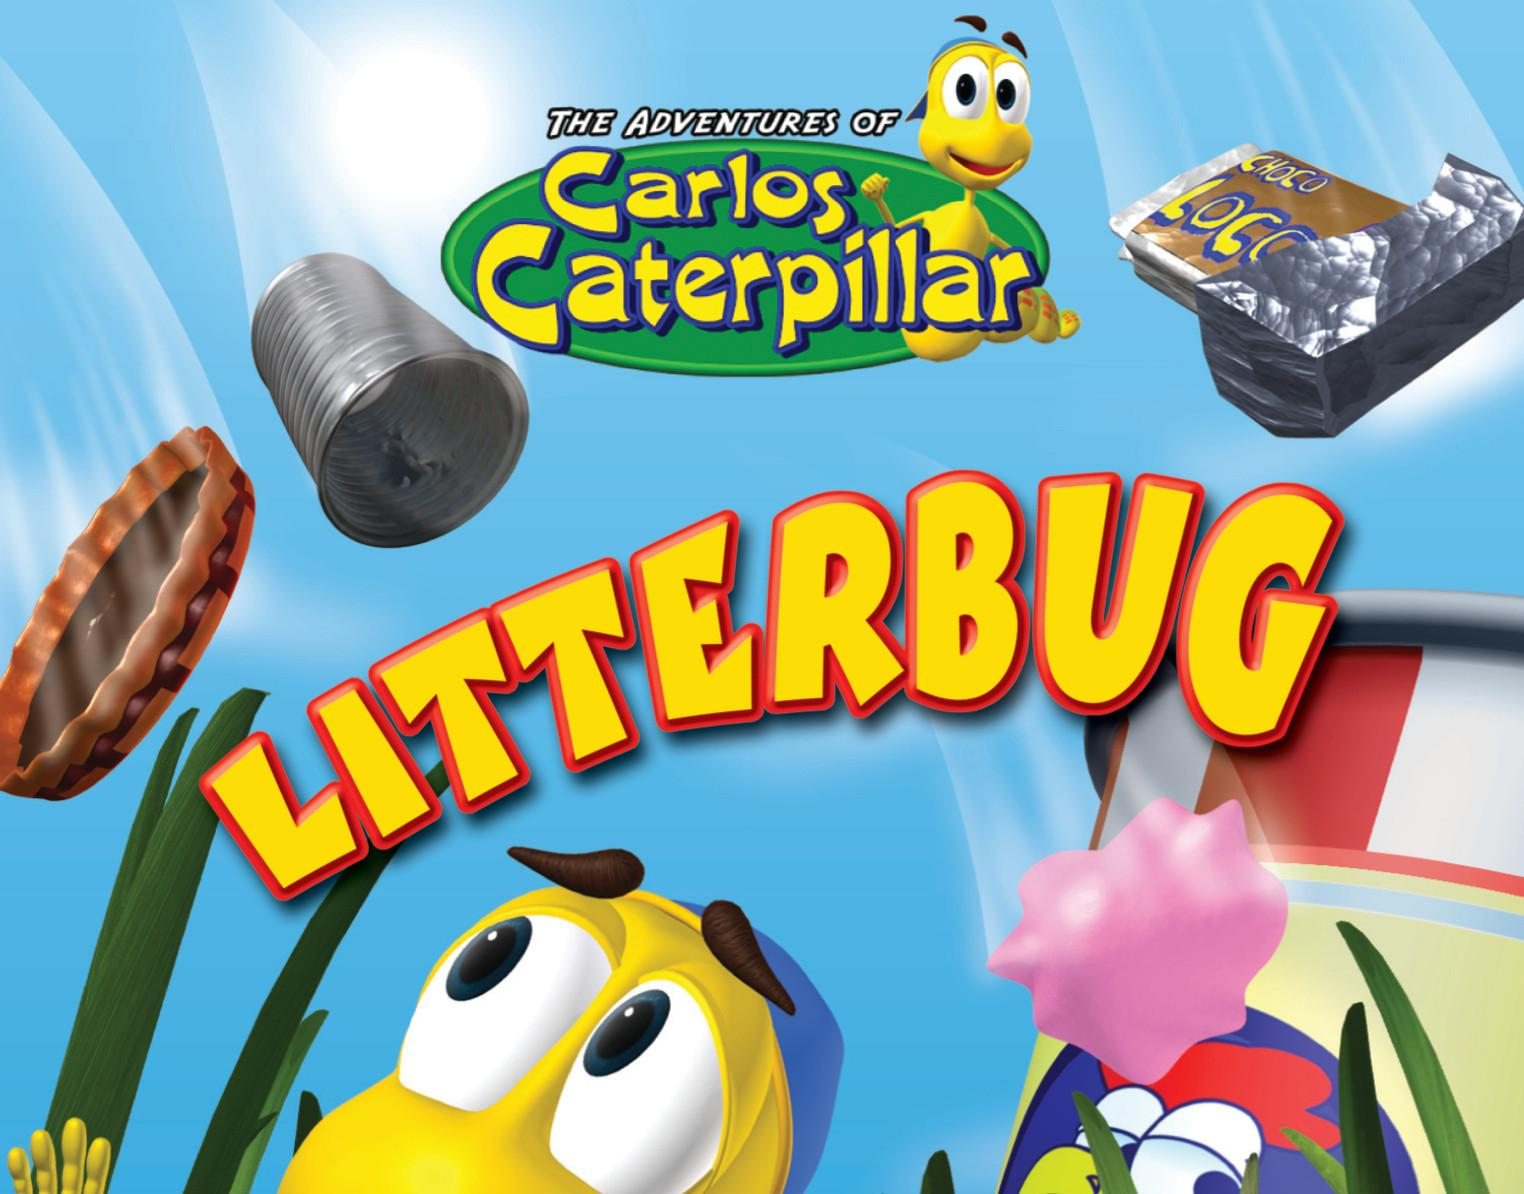 CC04 Litterbug